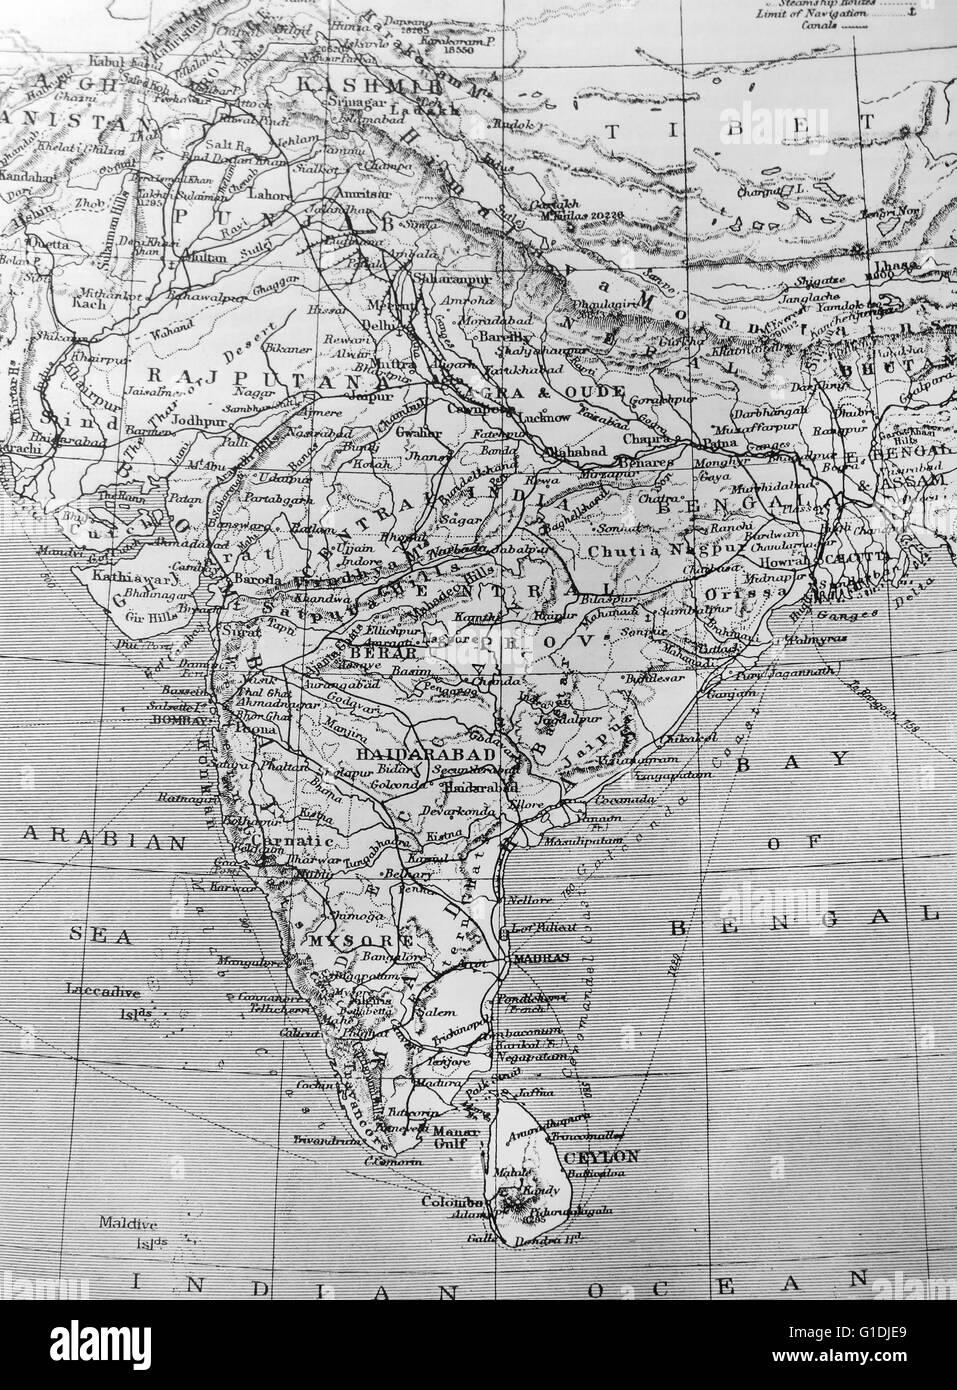 India map black and white stock photos images alamy map of india stock image gumiabroncs Choice Image